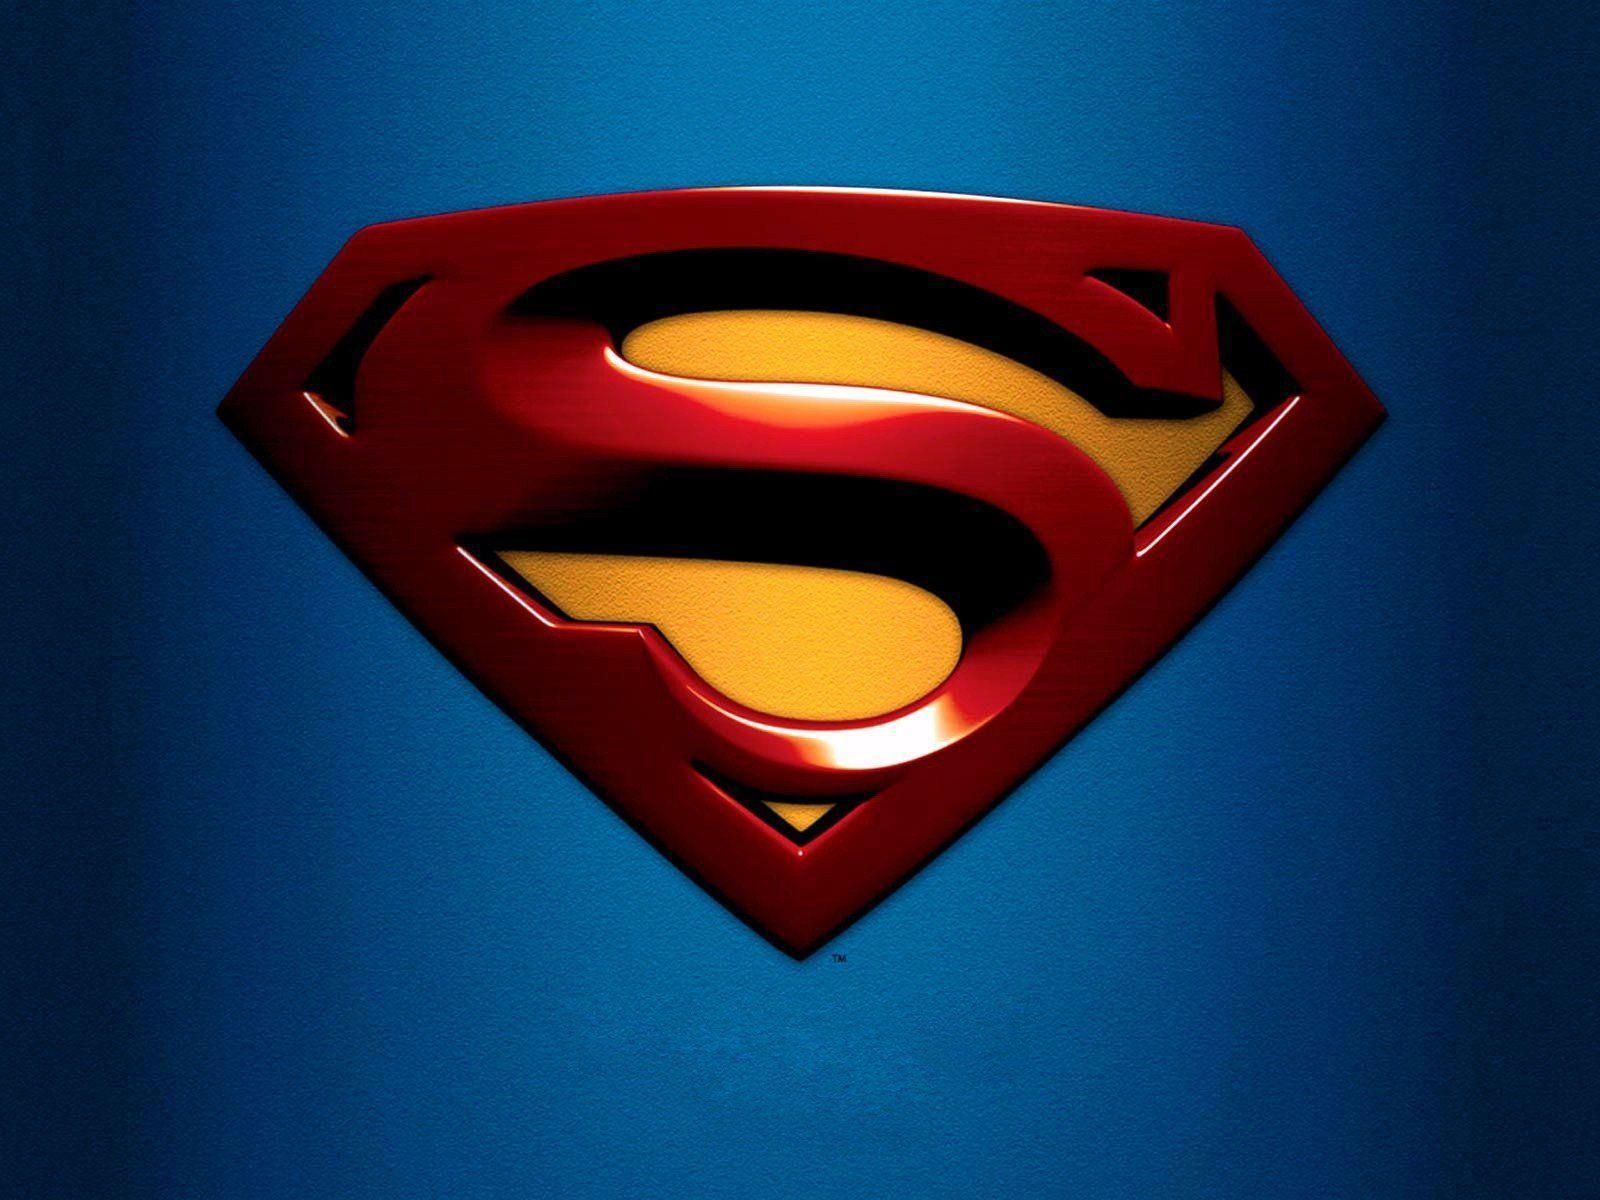 Superman Logo Wallpapers - Top Free